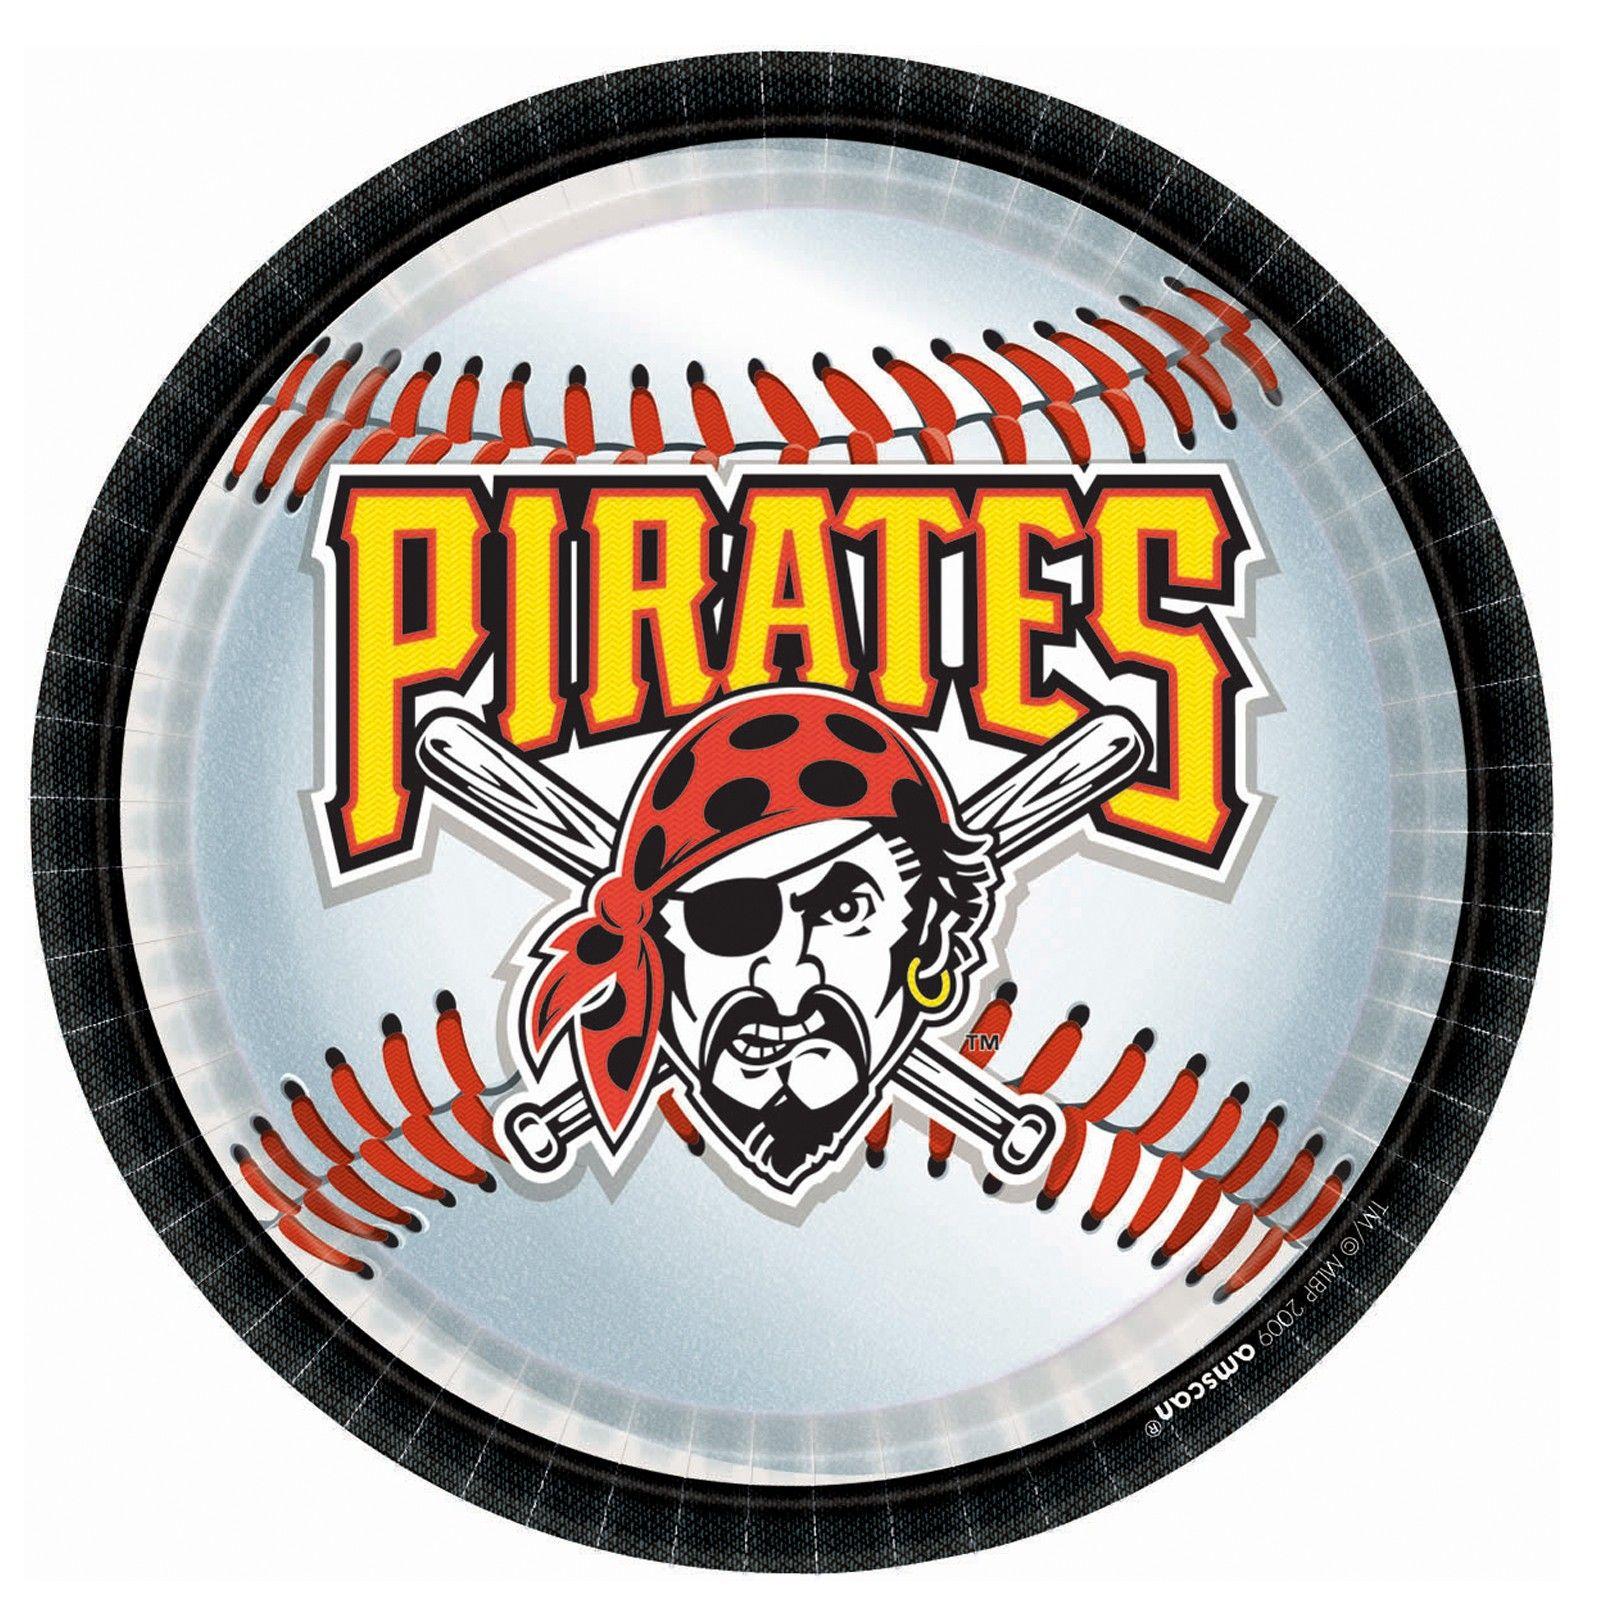 Votto powers Reds past reeling Pirates 8-7 | WKBN.com